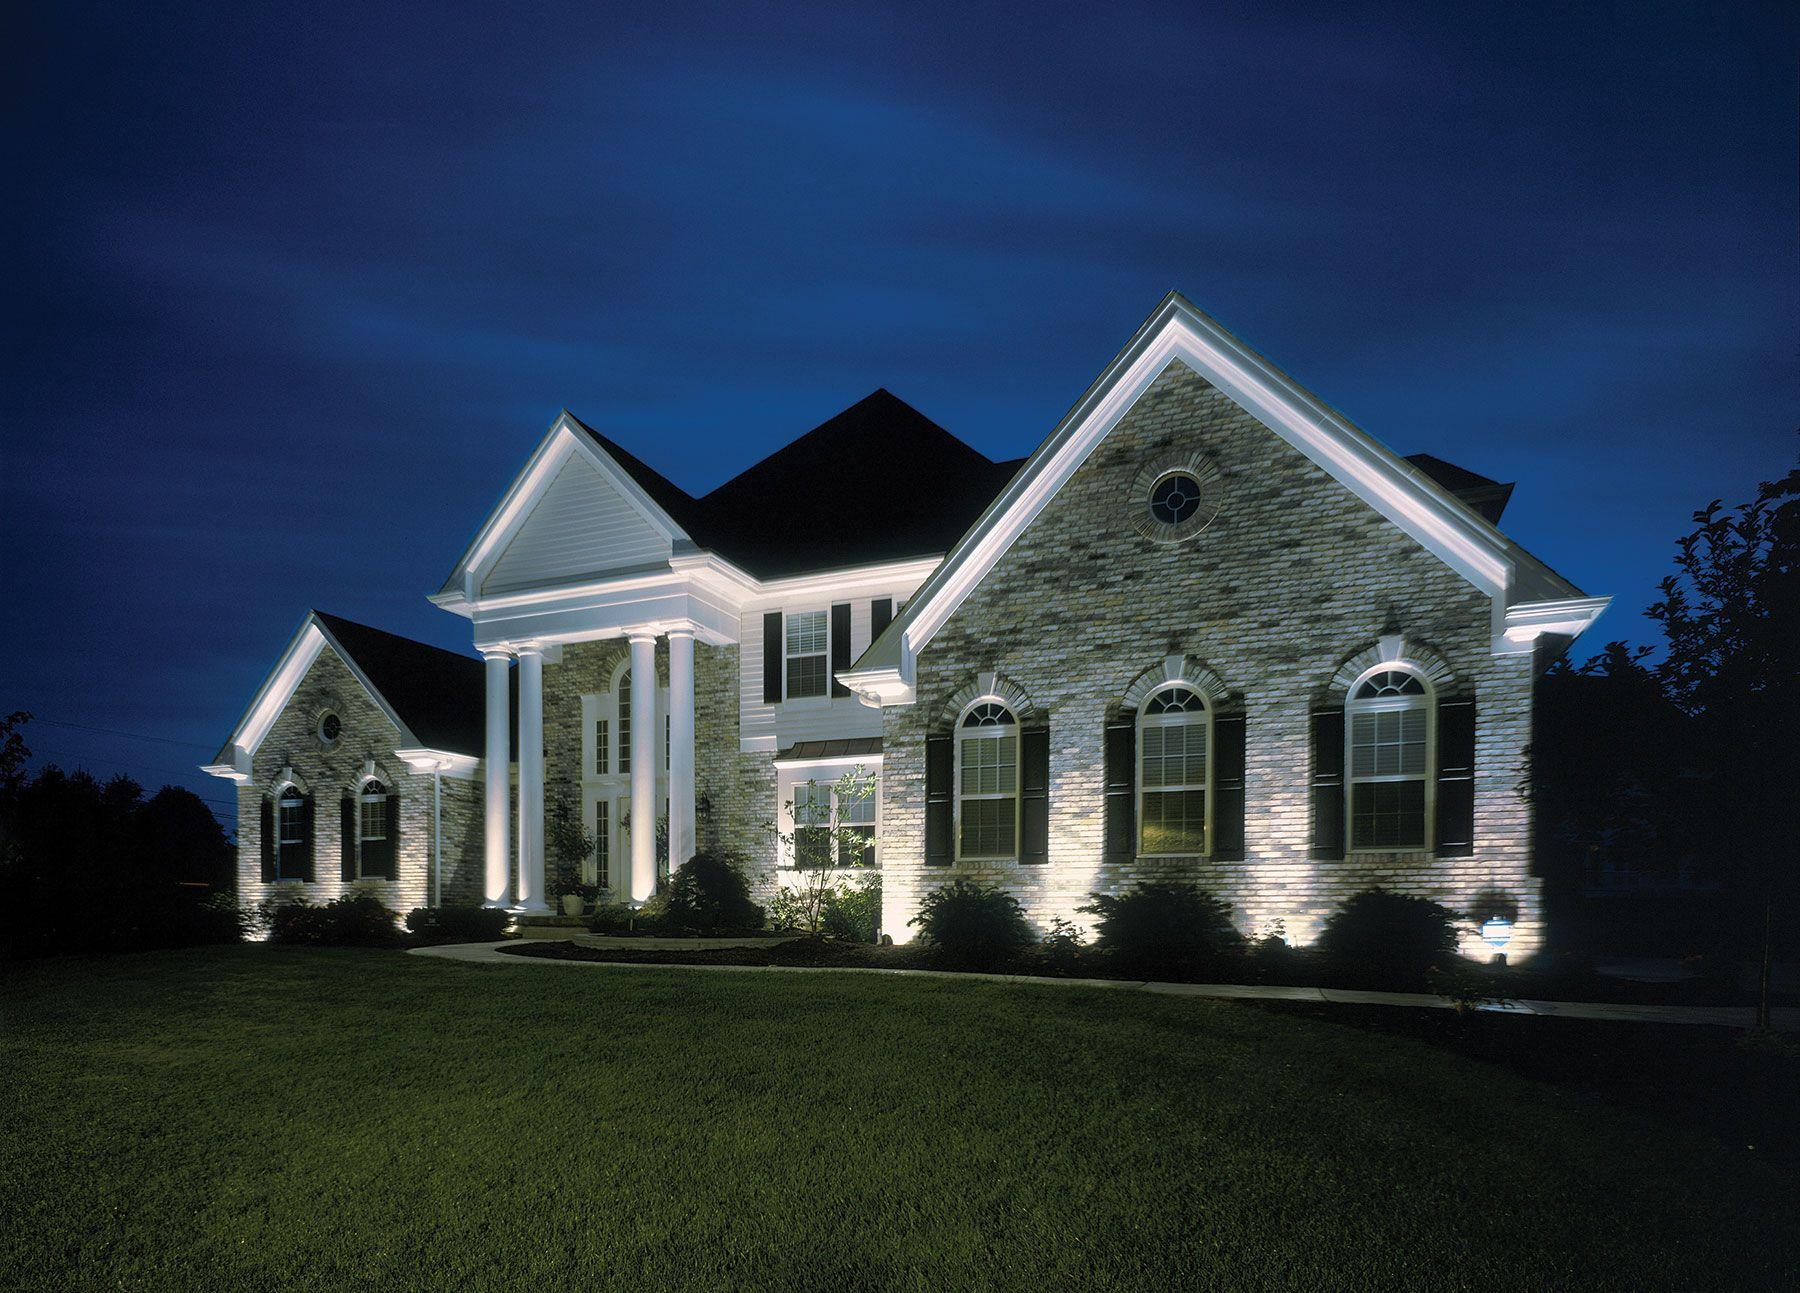 Outdoor Lighting Perspectives Exterior Lighting Design Outdoor Lighting Design Exterior House Lights